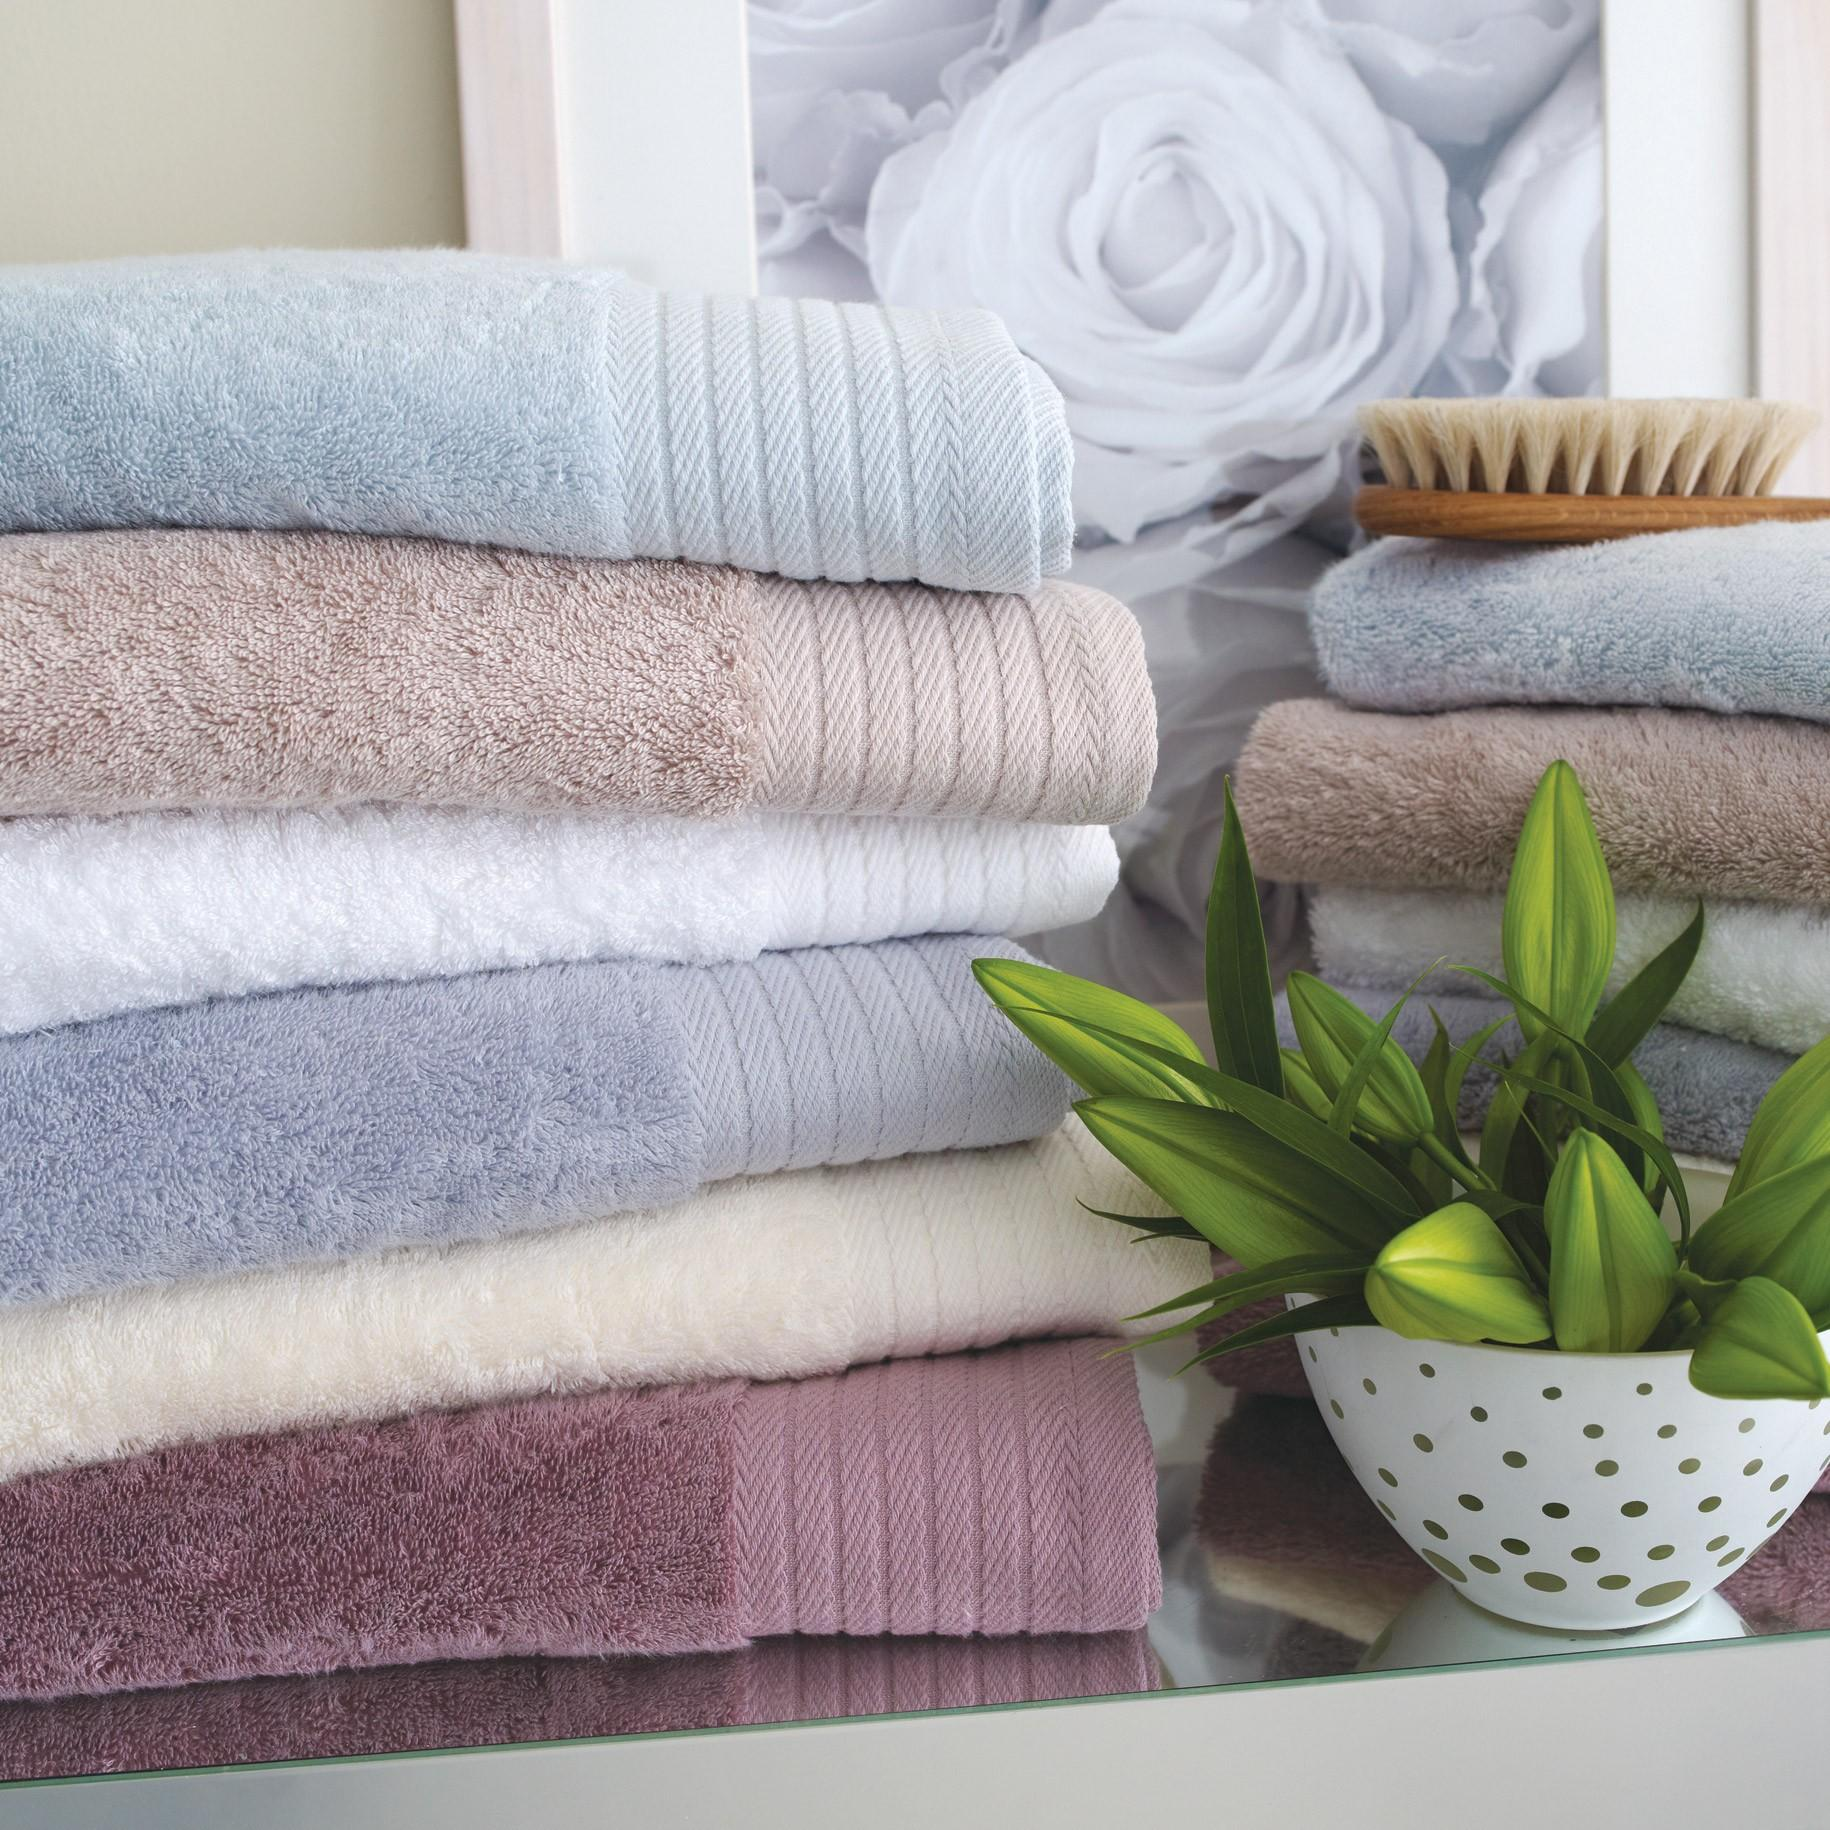 hotel-towels-2010_2_1_1_2